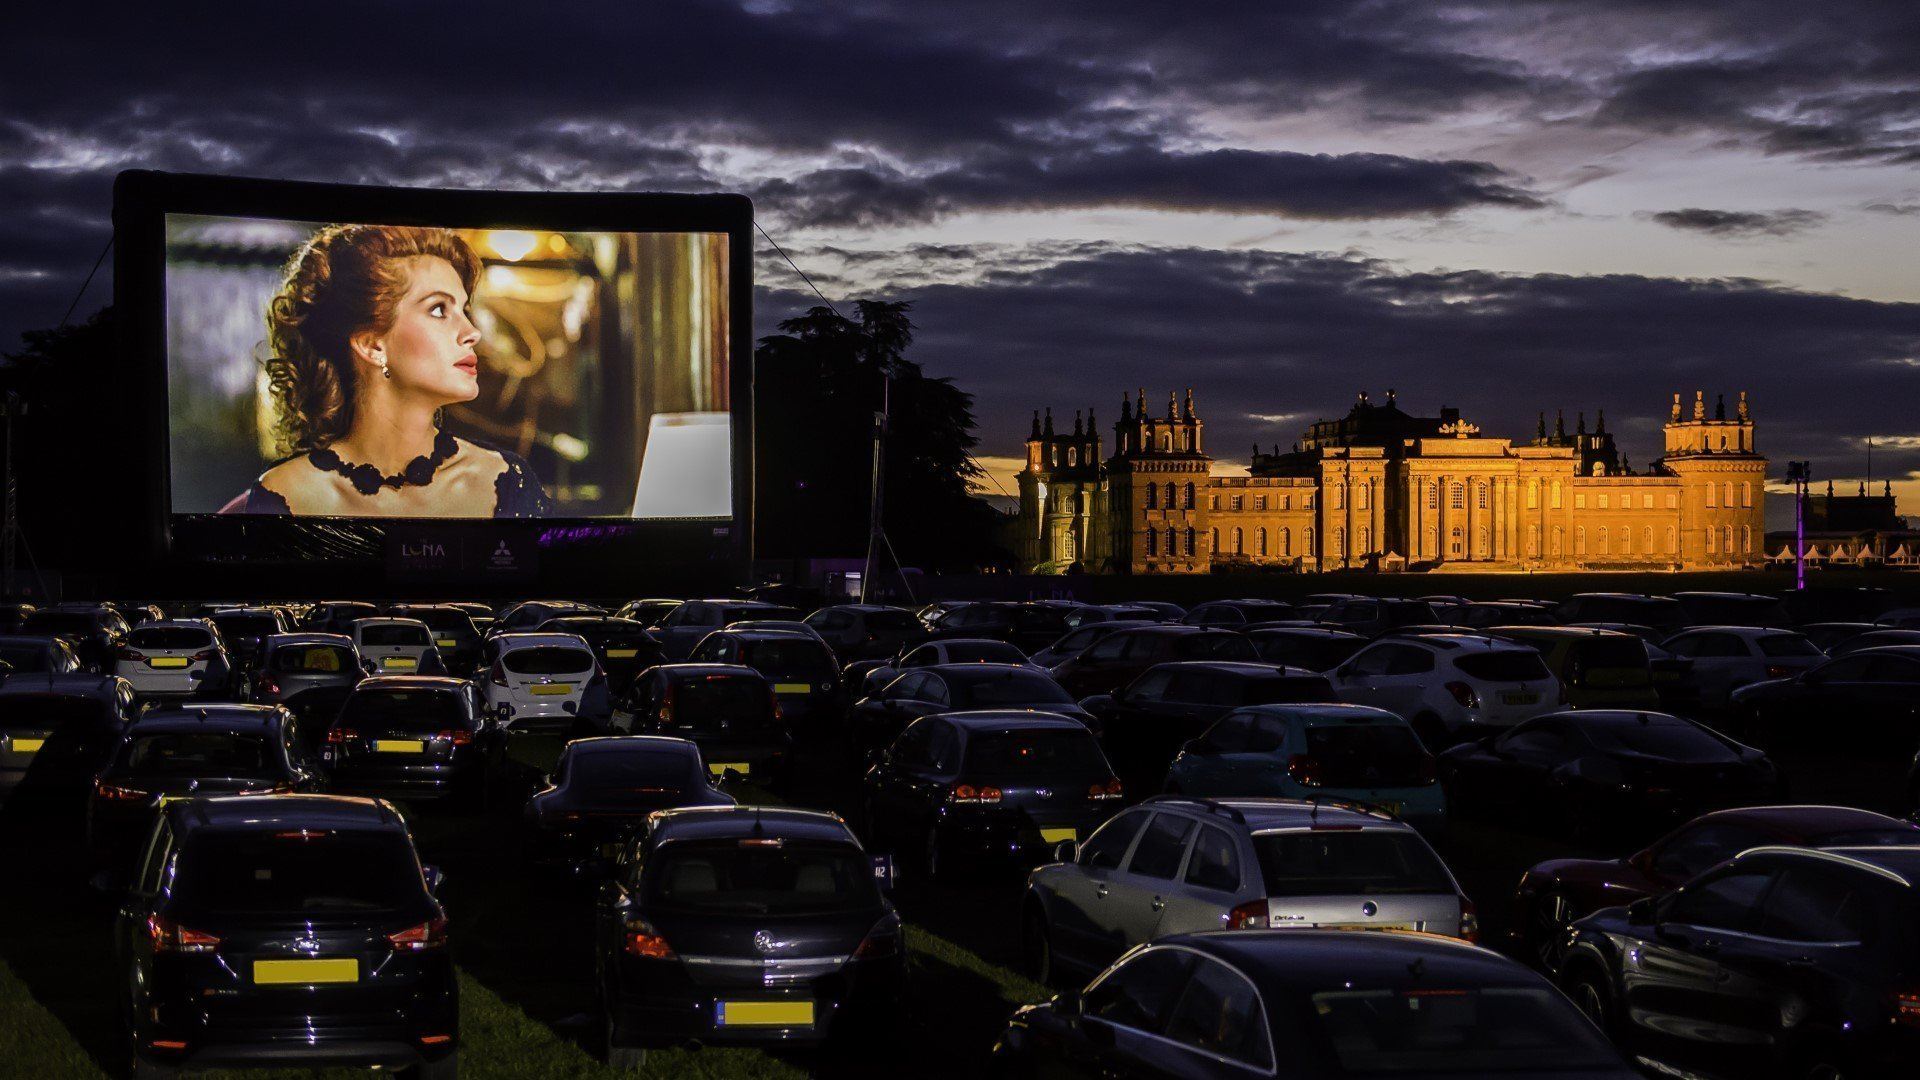 the-luna-drive-in-cinema-at-blenheim-palace